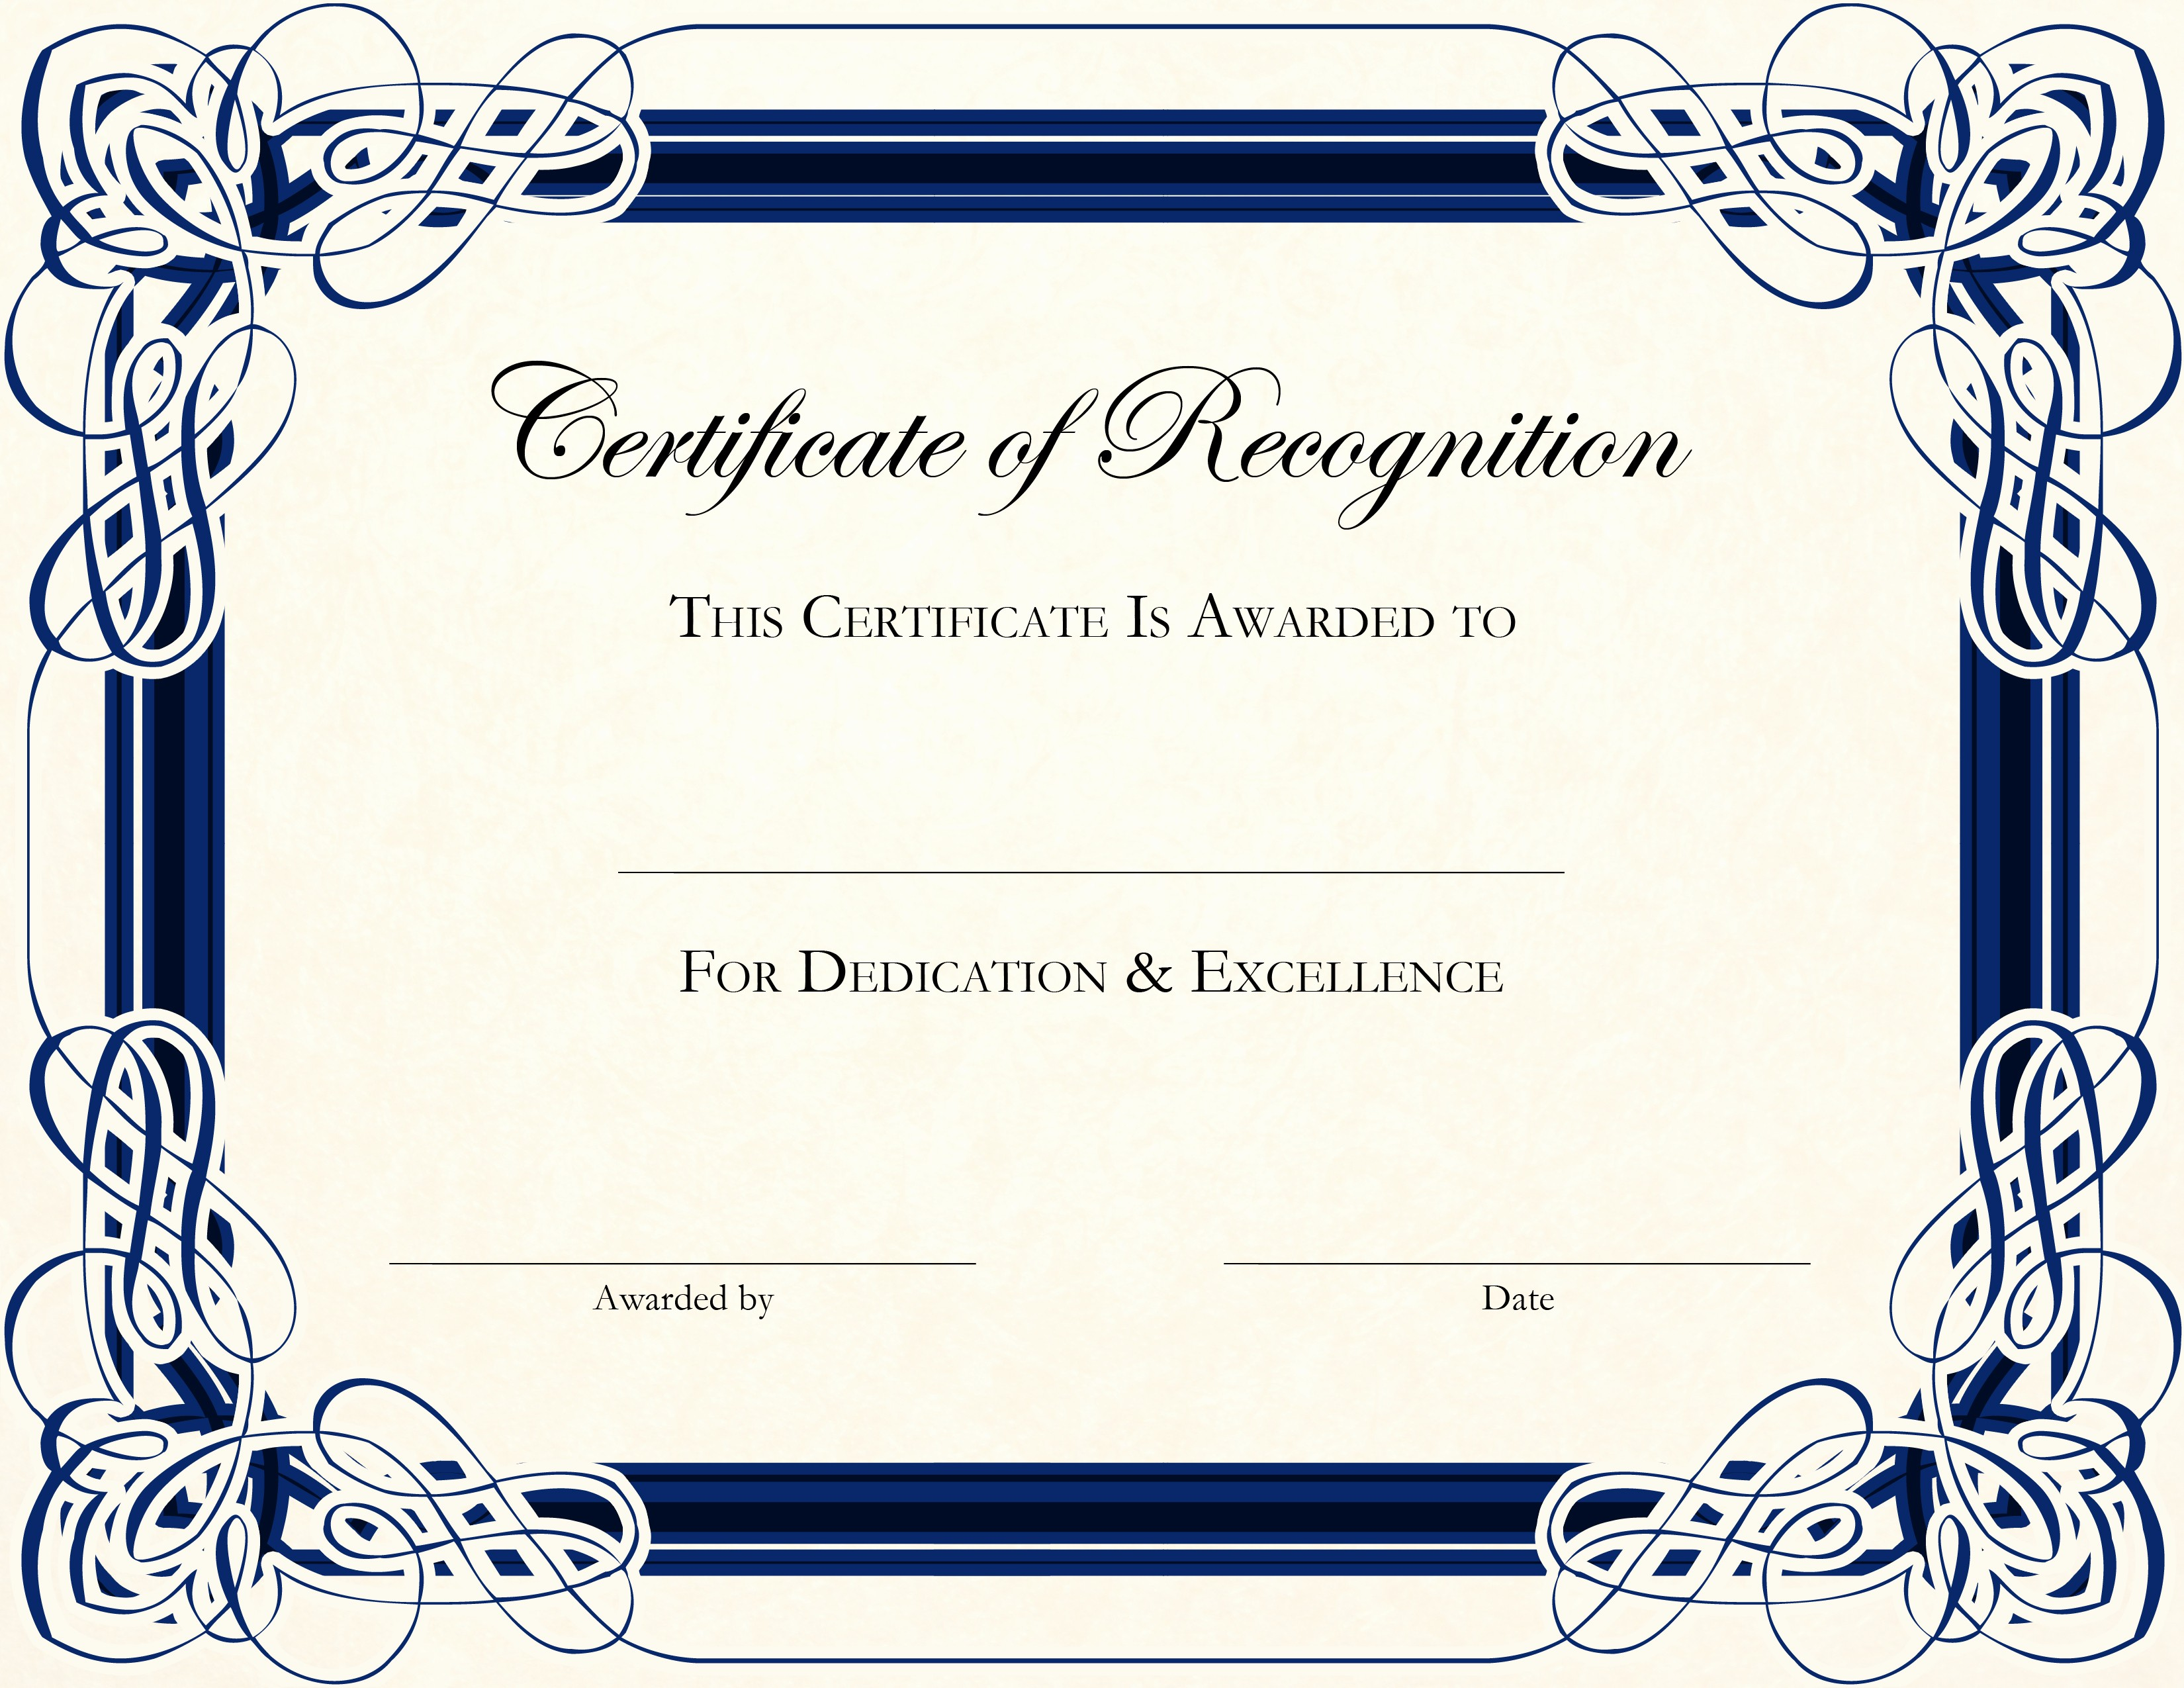 Template for Certificate Of Appreciation Lovely Templates for Certificates Appreciation